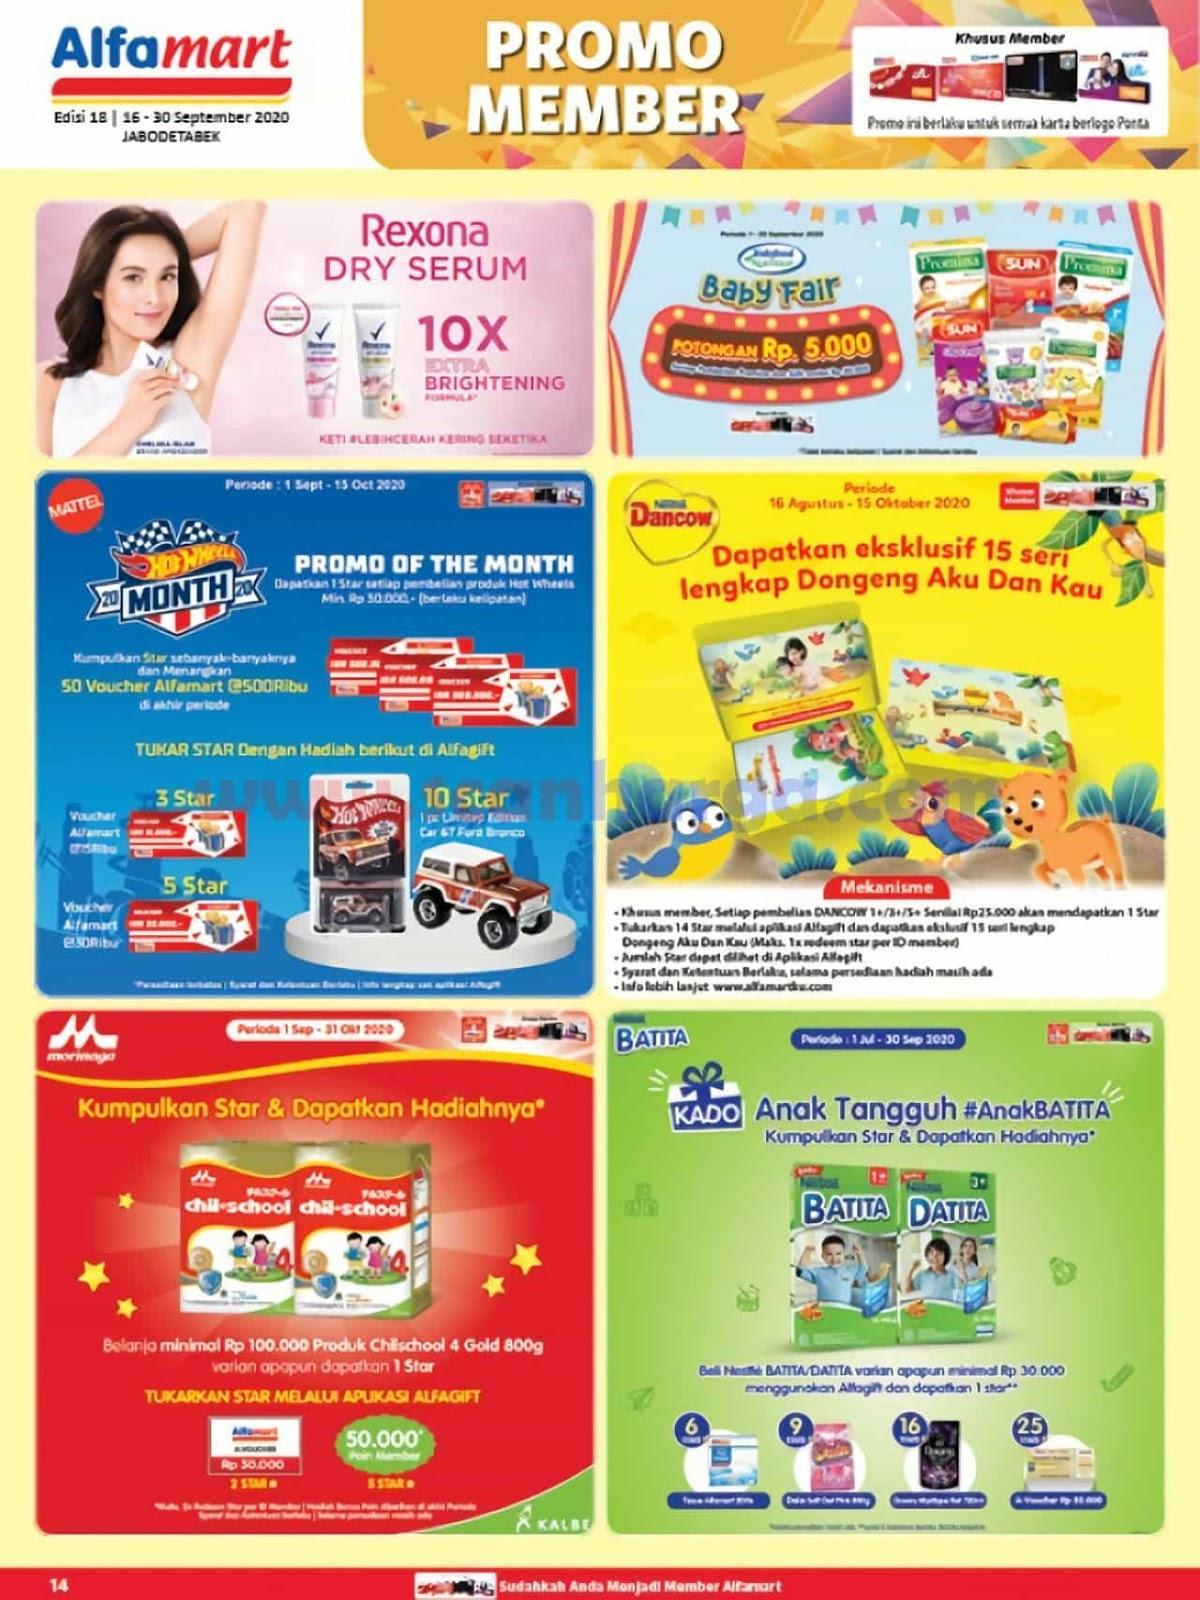 Katalog Promo Alfamart 16 - 30 September 2020 14